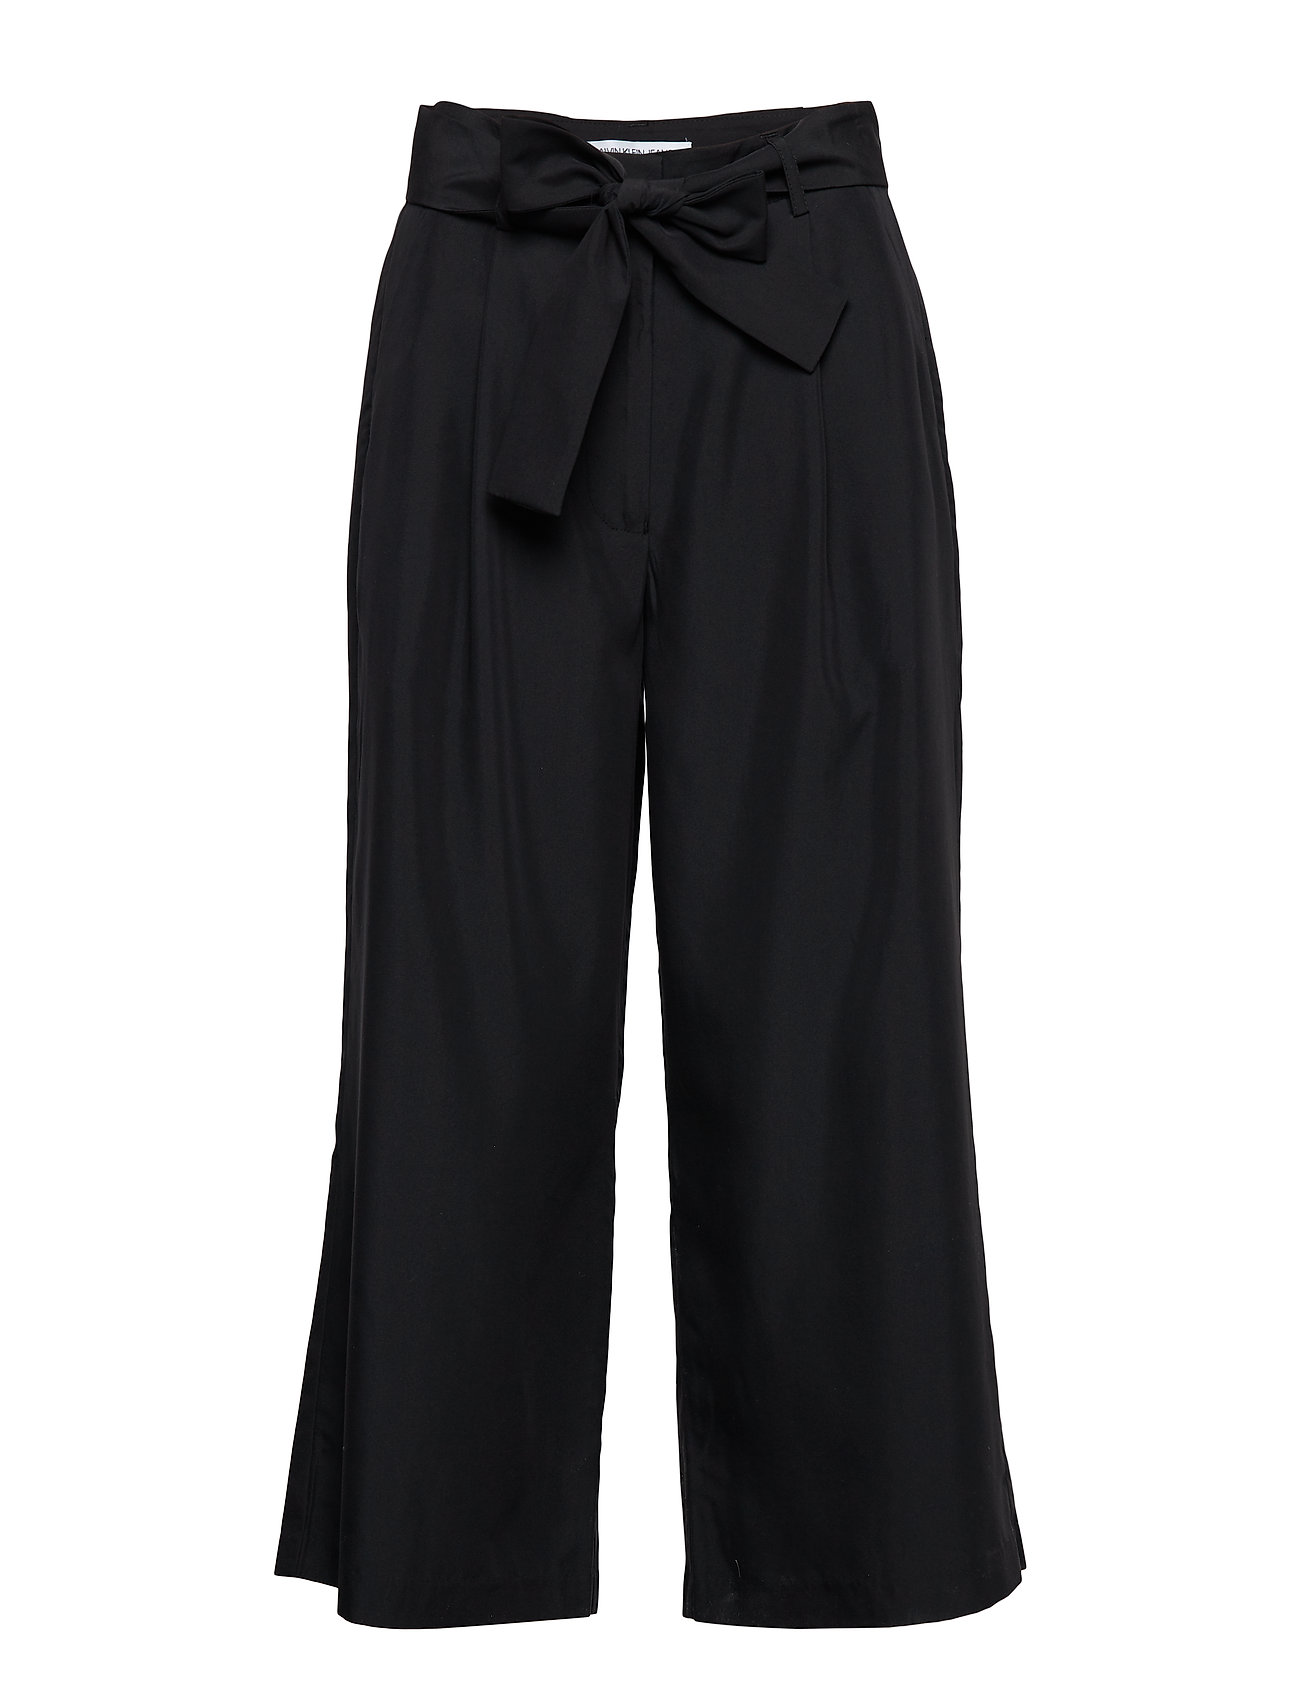 Calvin Klein Jeans DRAPEY TENCEL STRAIG - CK BLACK